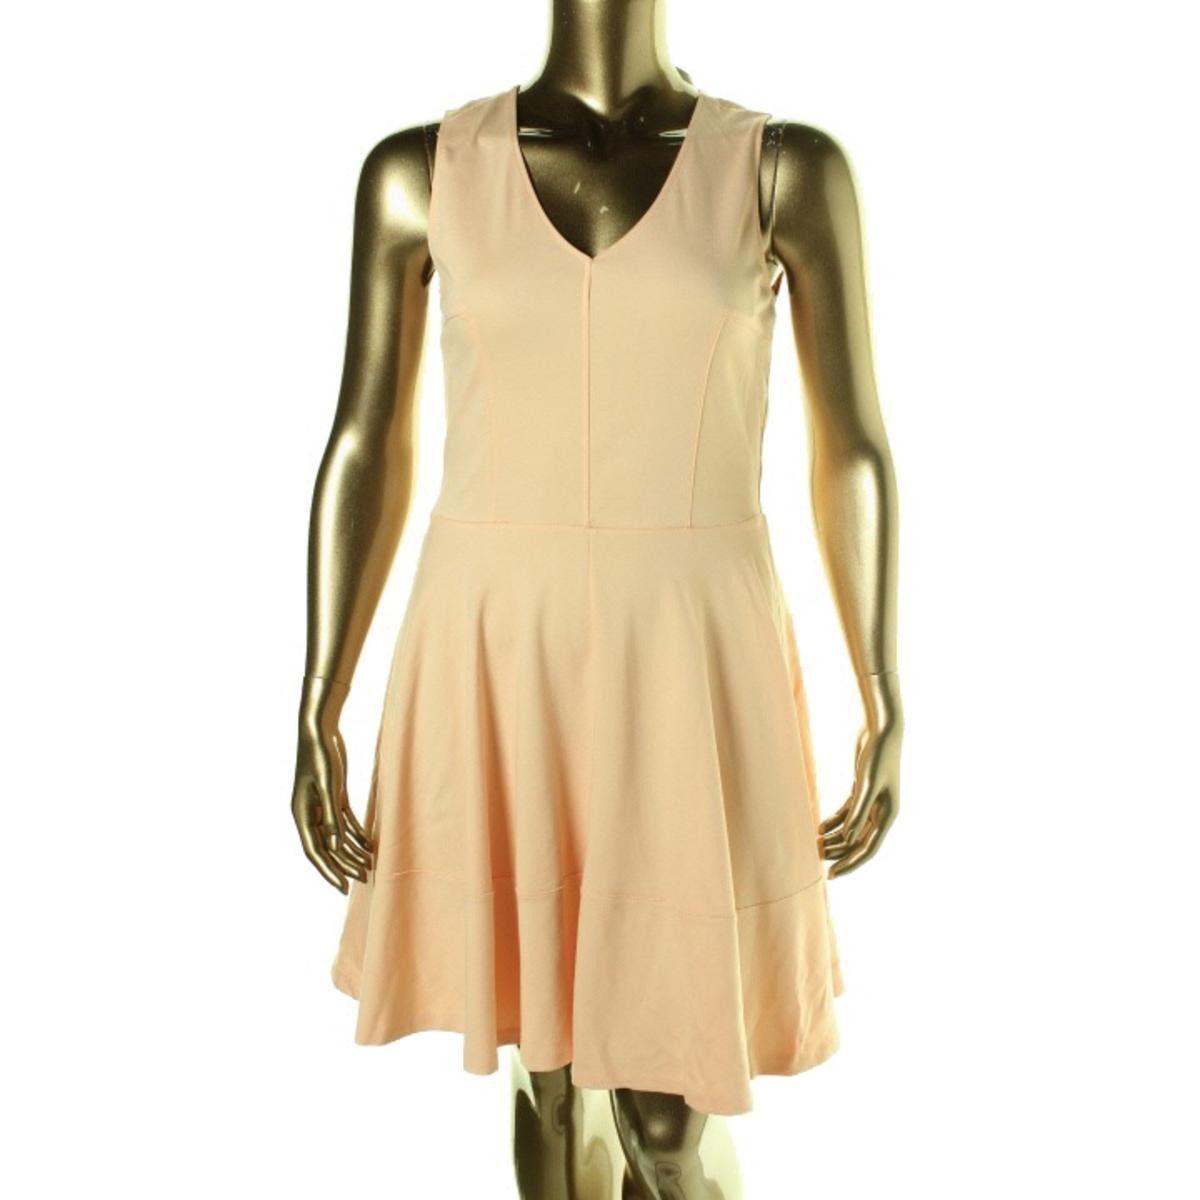 Bar III Womens A-Line Seamed Wear to Work Dress